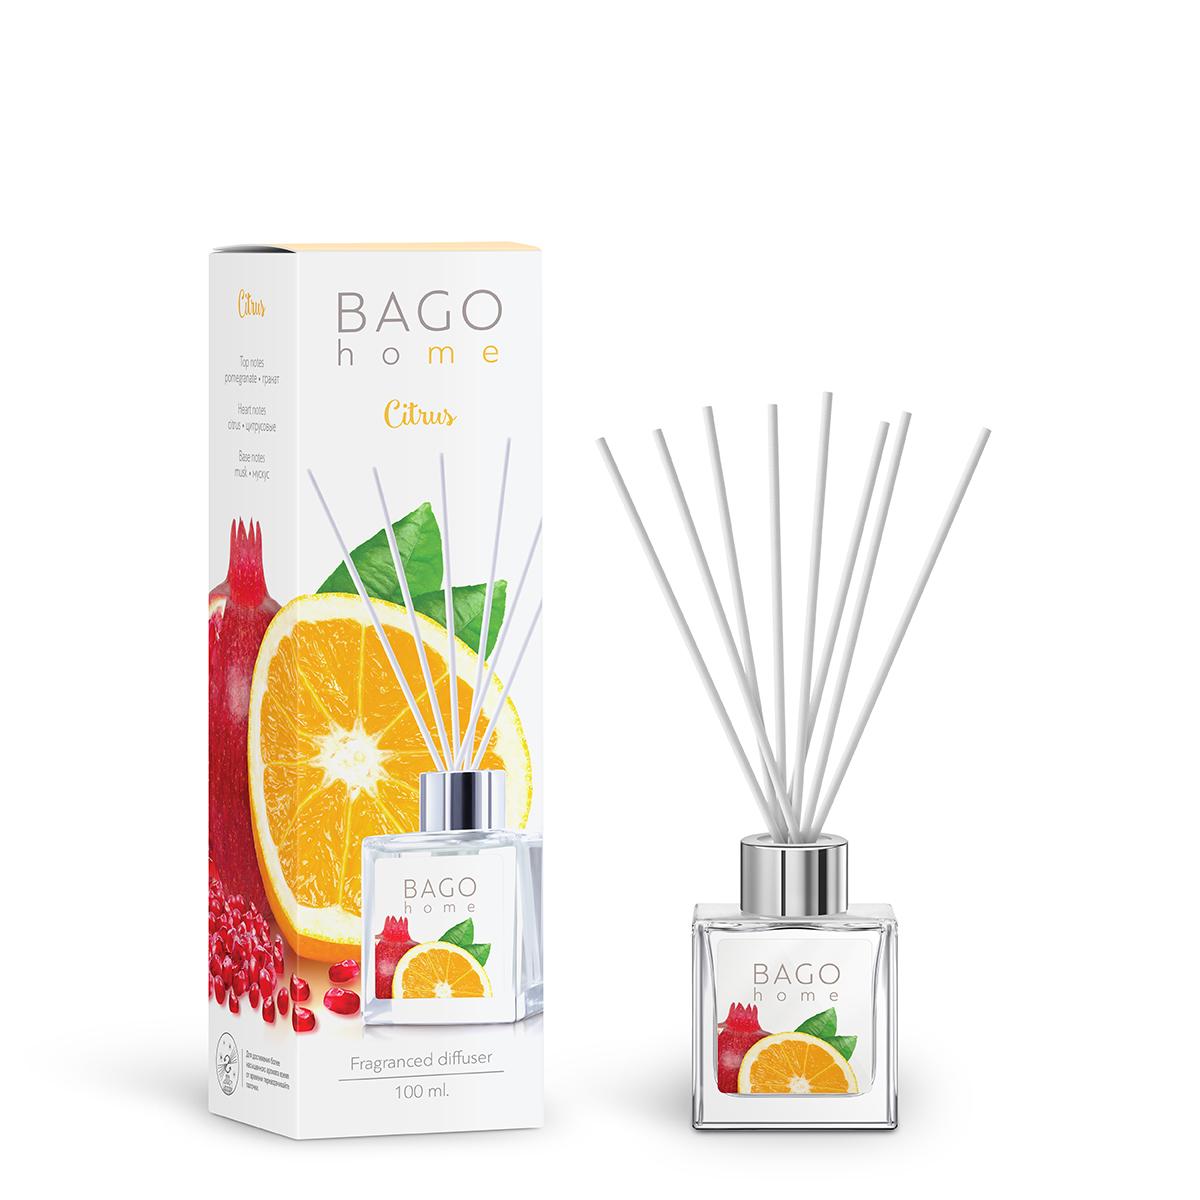 Ароматизатор интерьерный BAGO home Диффузор ароматический